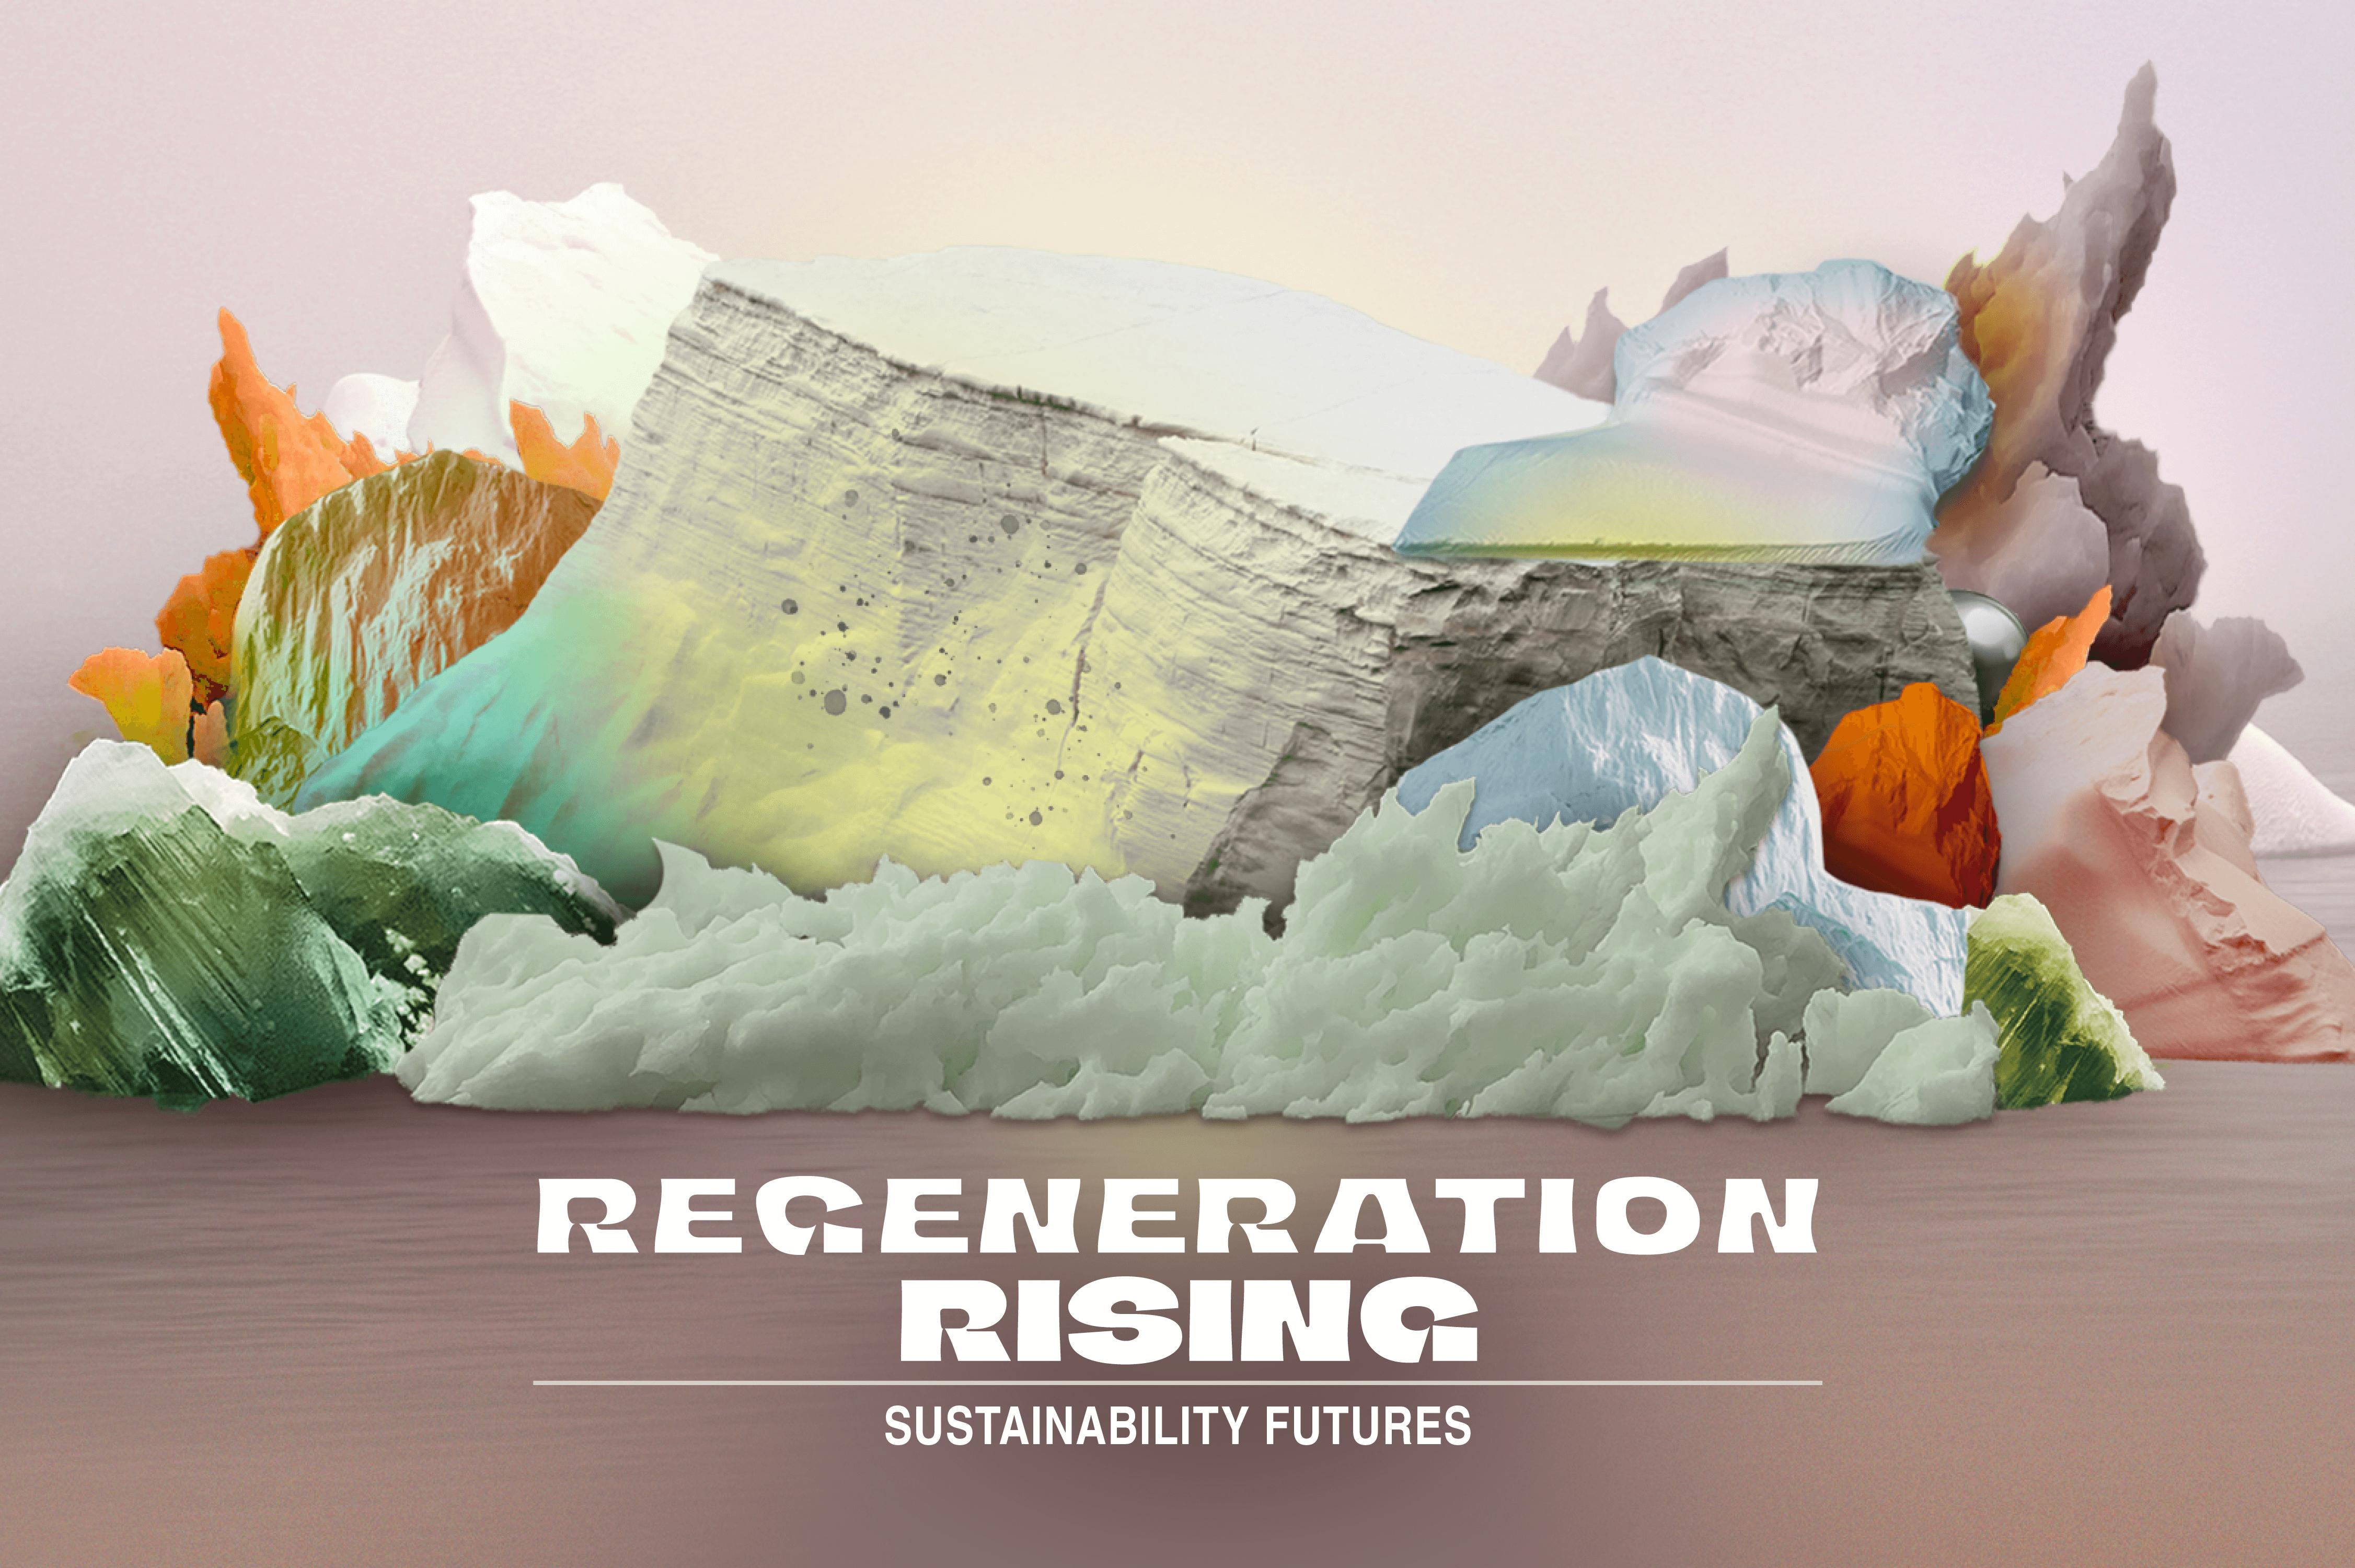 Regeneration-Rising-Front-Cover